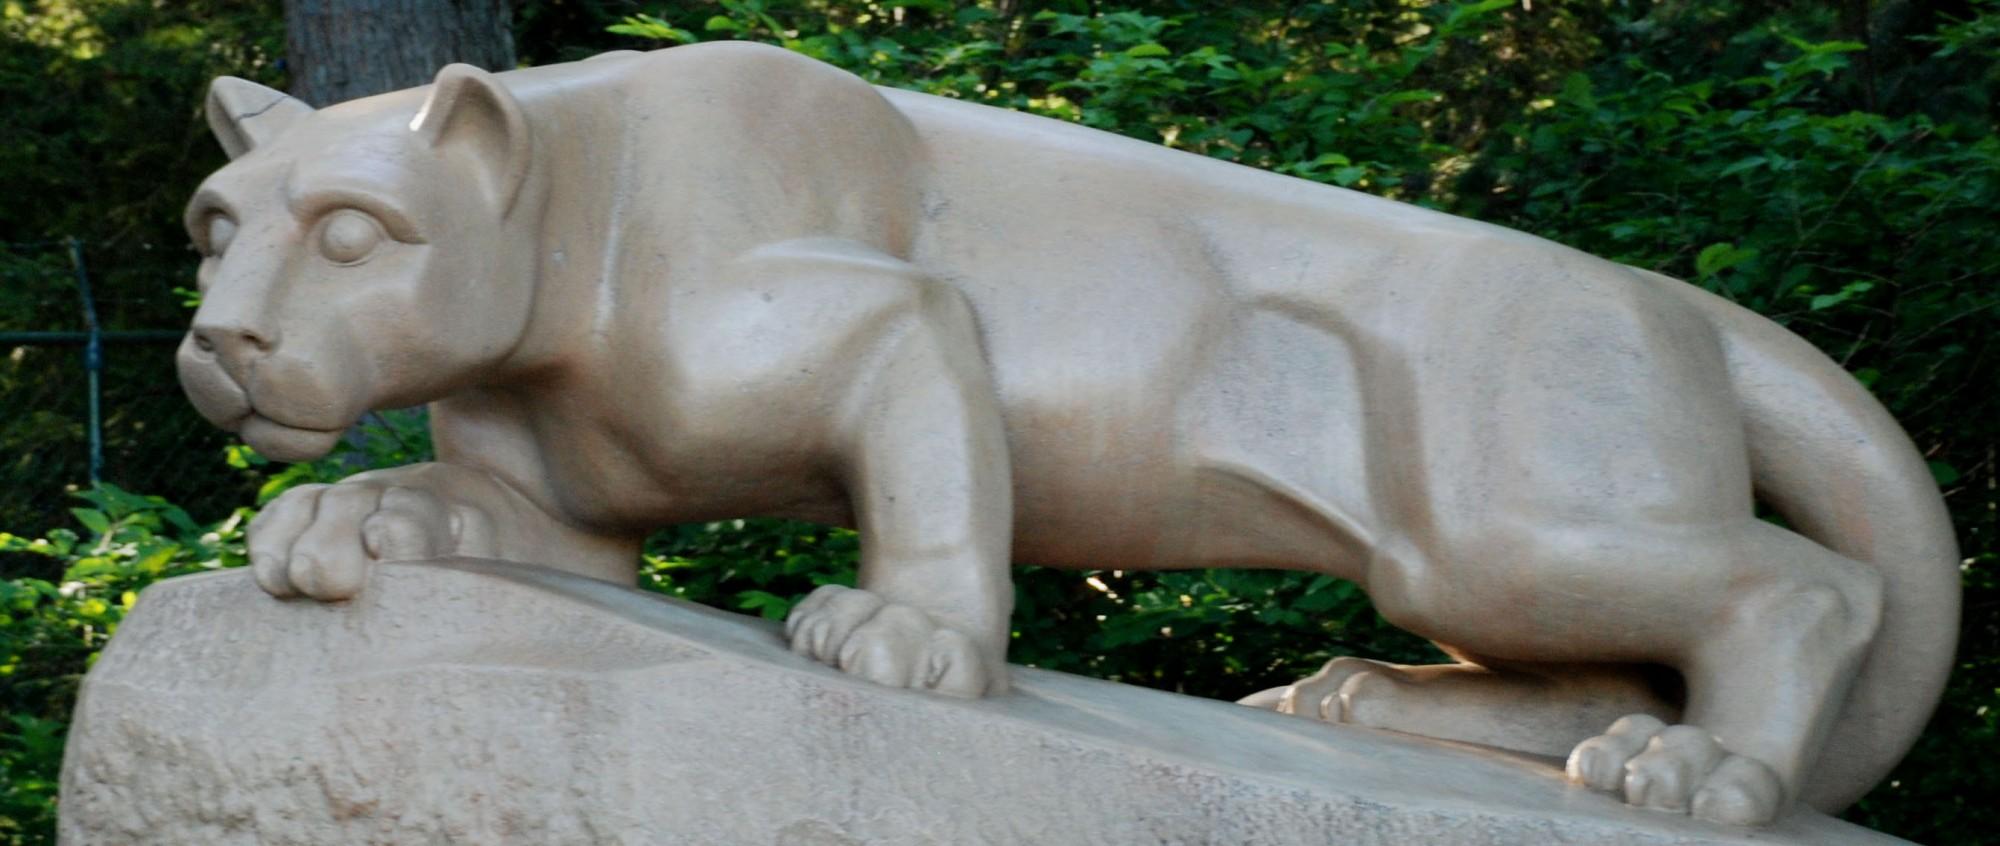 Nittany-Lion-Statue-Closeup--e1411054097728